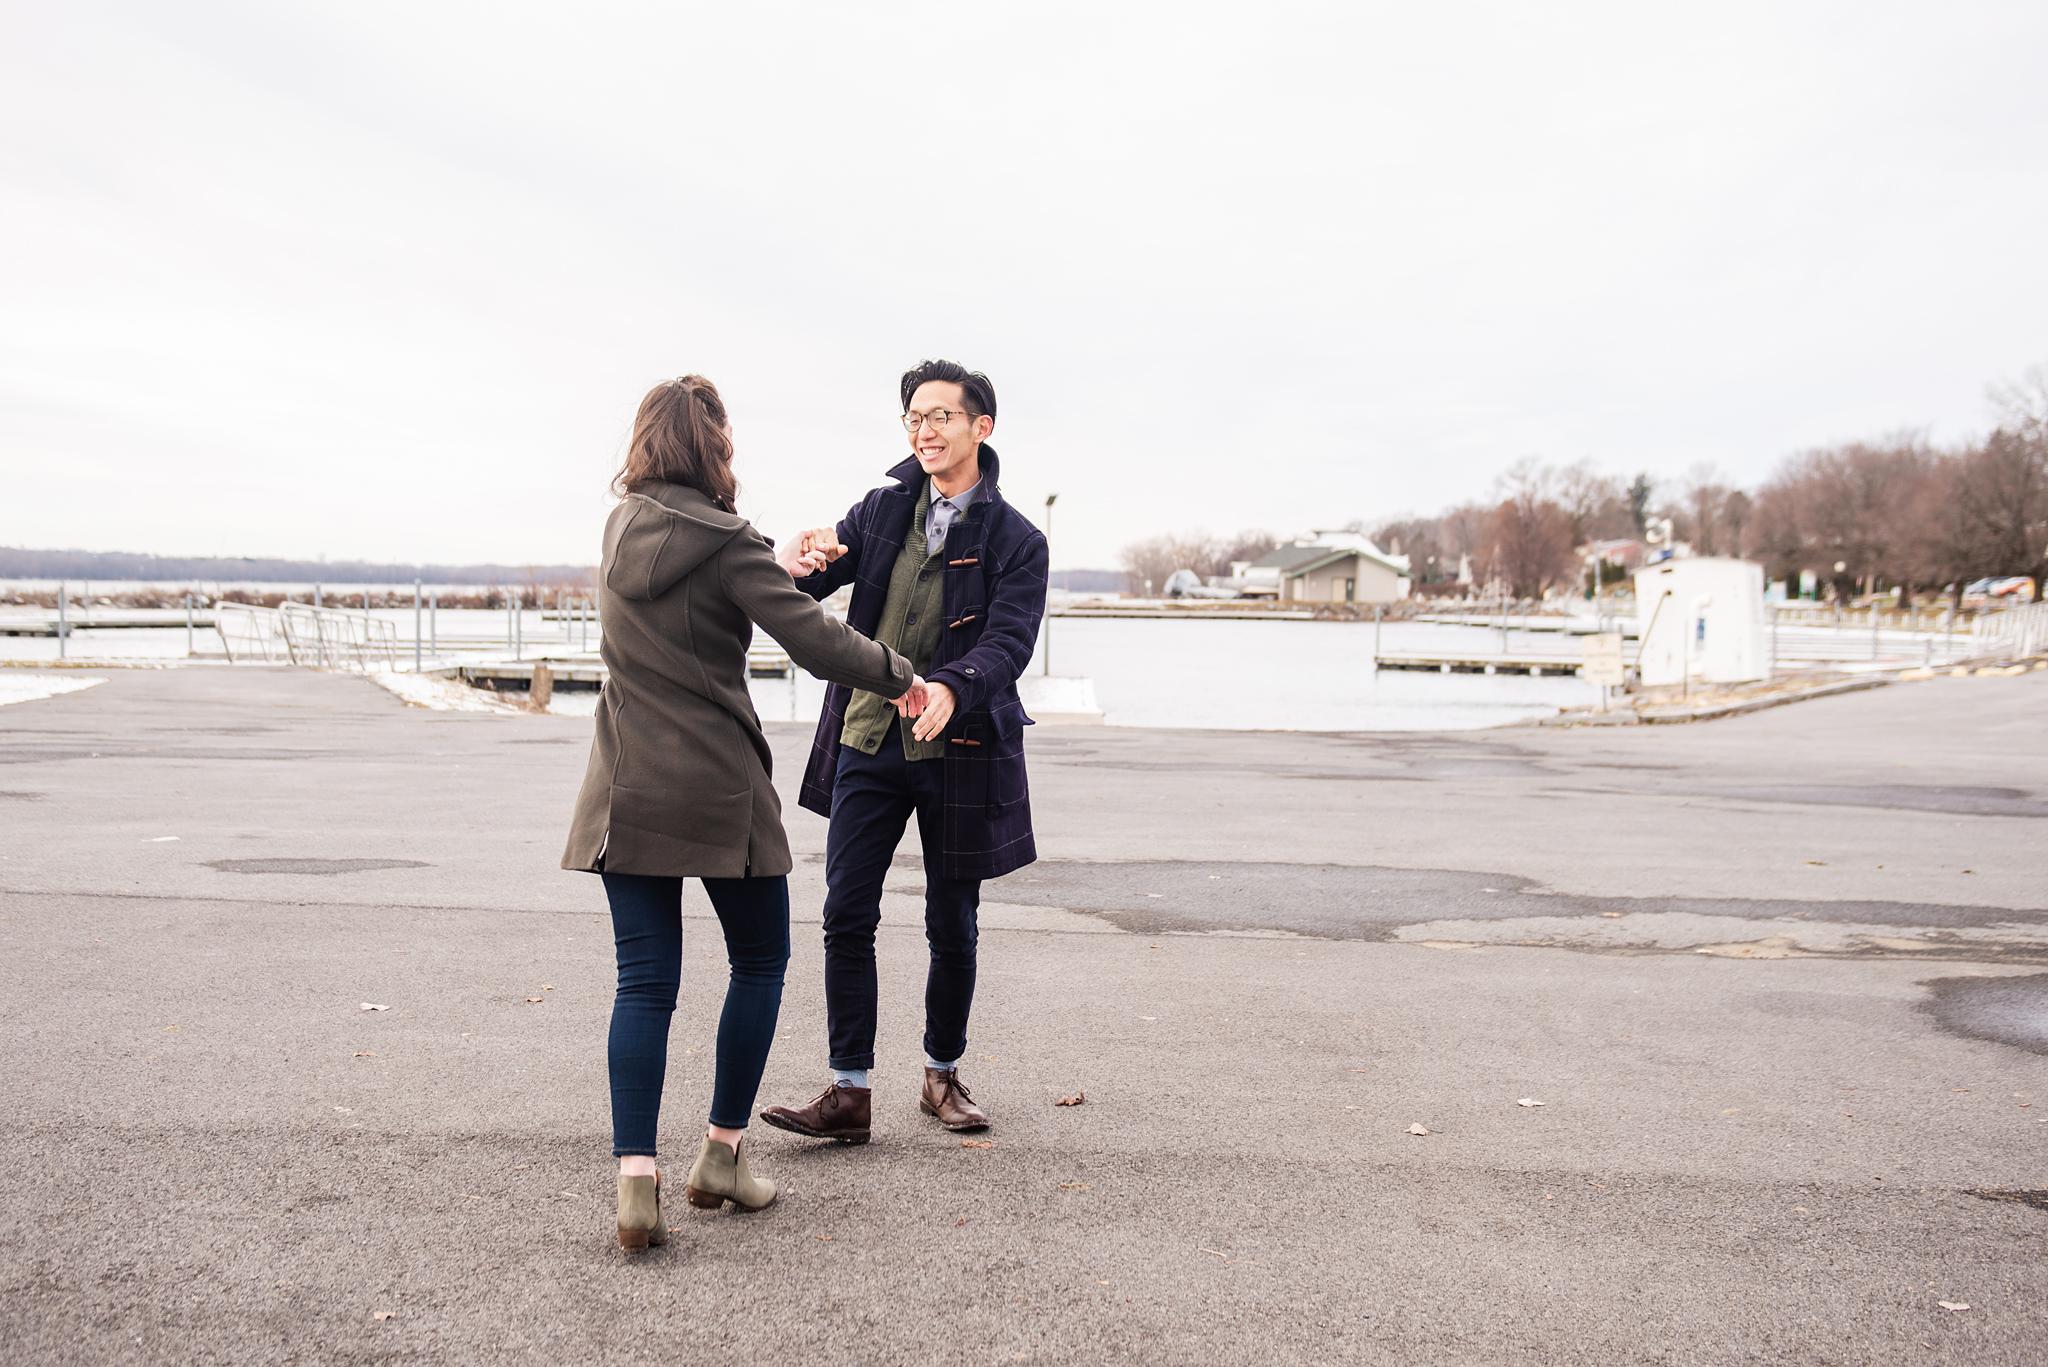 Onondaga_Lake_Park_Syracuse_Engagement_Session_JILL_STUDIO_Rochester_NY_Photographer_DSC_3230.jpg